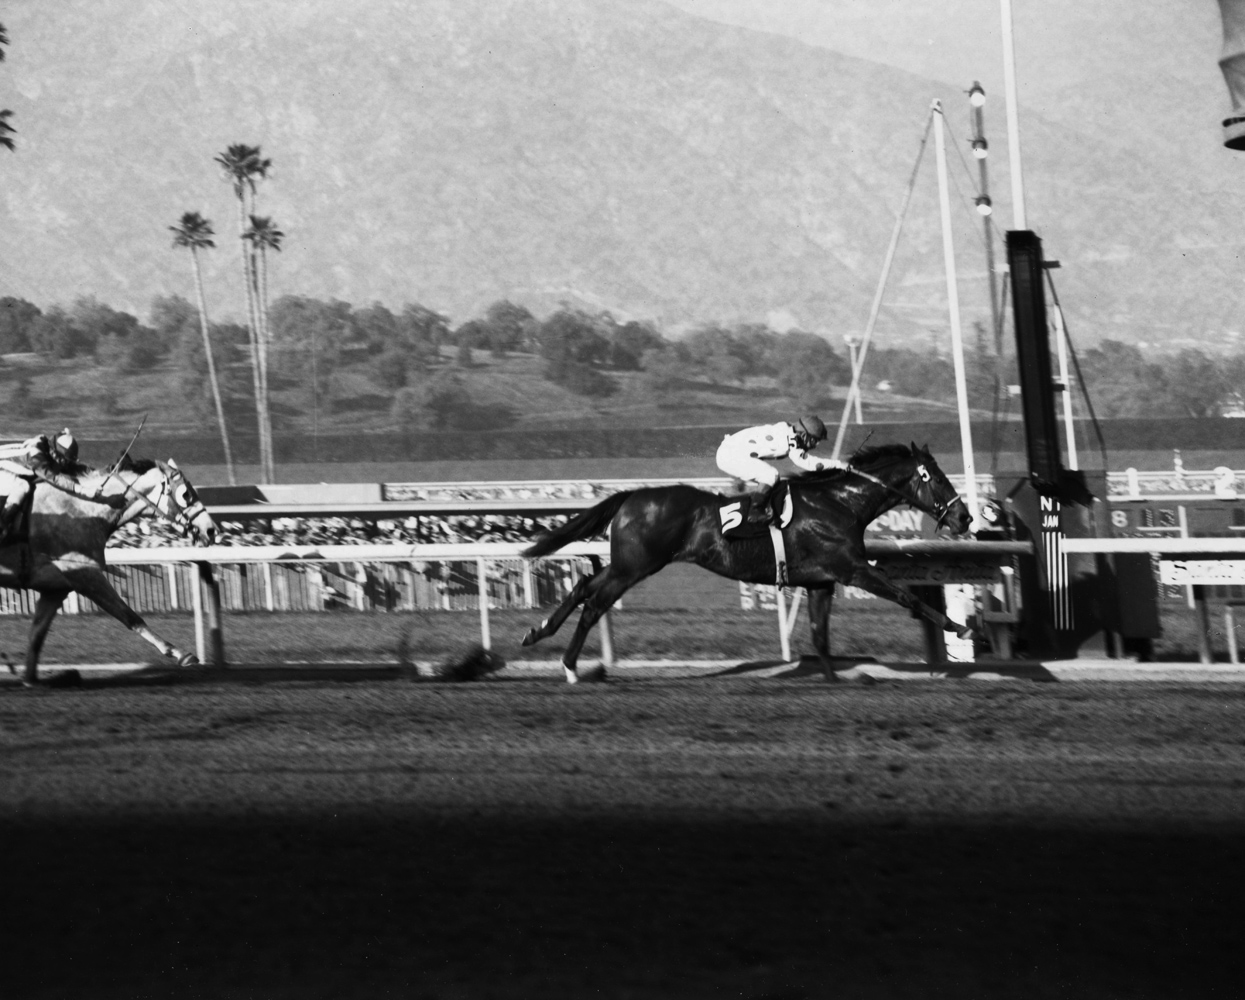 Damascus (Bill Shoemaker up) winning the 1968 San Fernando at Santa Anita Park (Santa Anita Photo/Museum Collection)